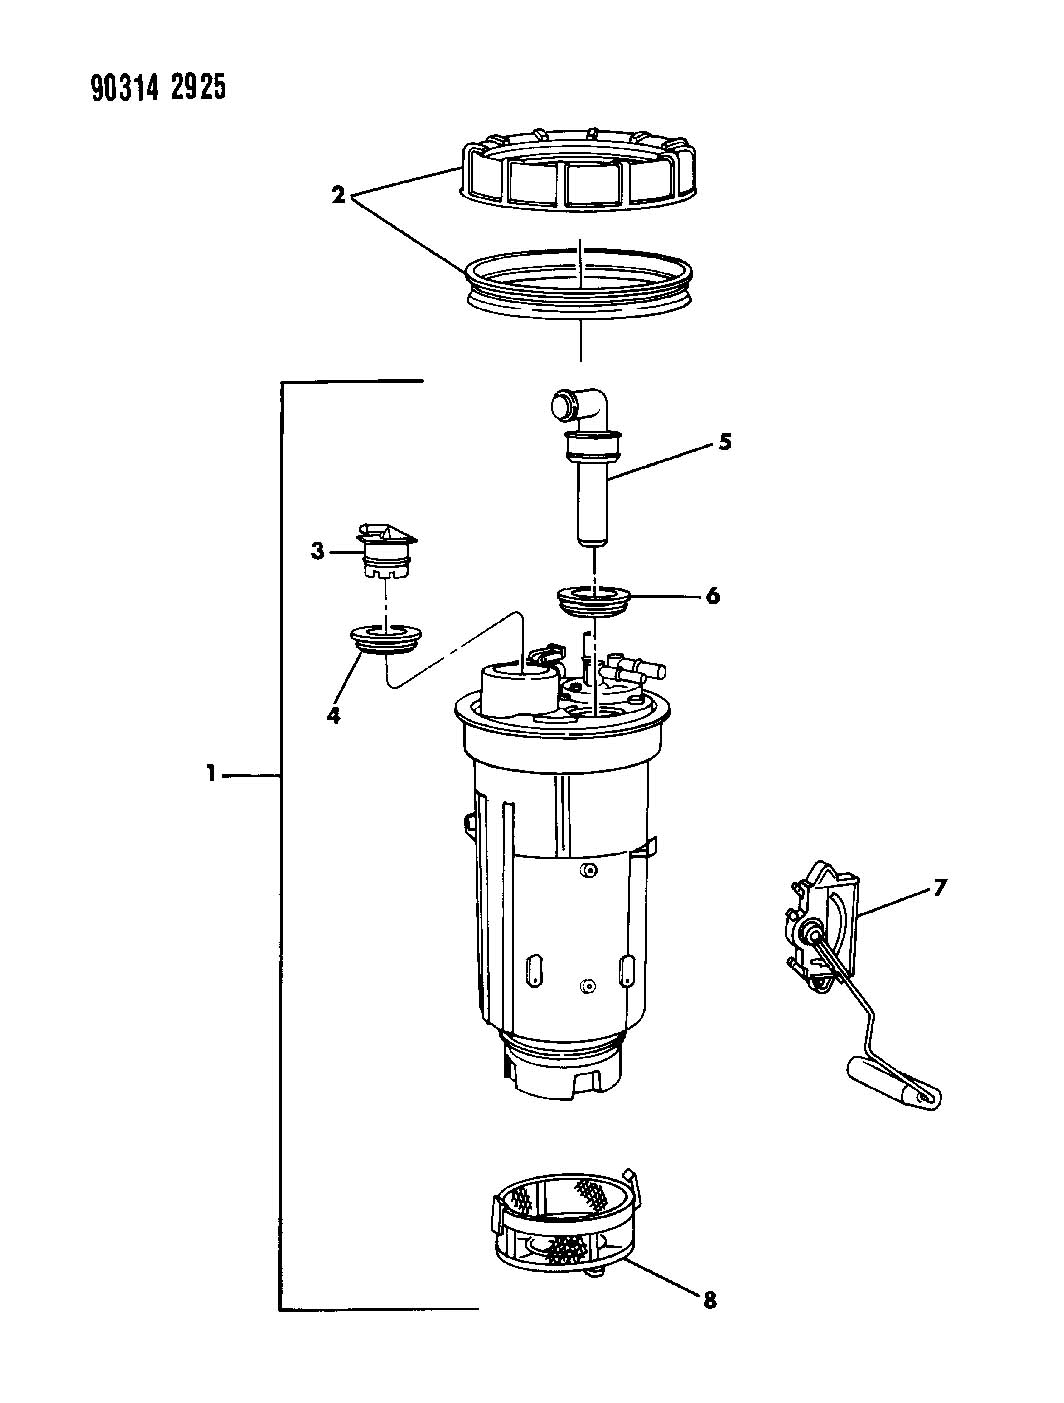 1993 Dodge Dakota Fuel Pump And Level Unit 2 5 3 9 5 2